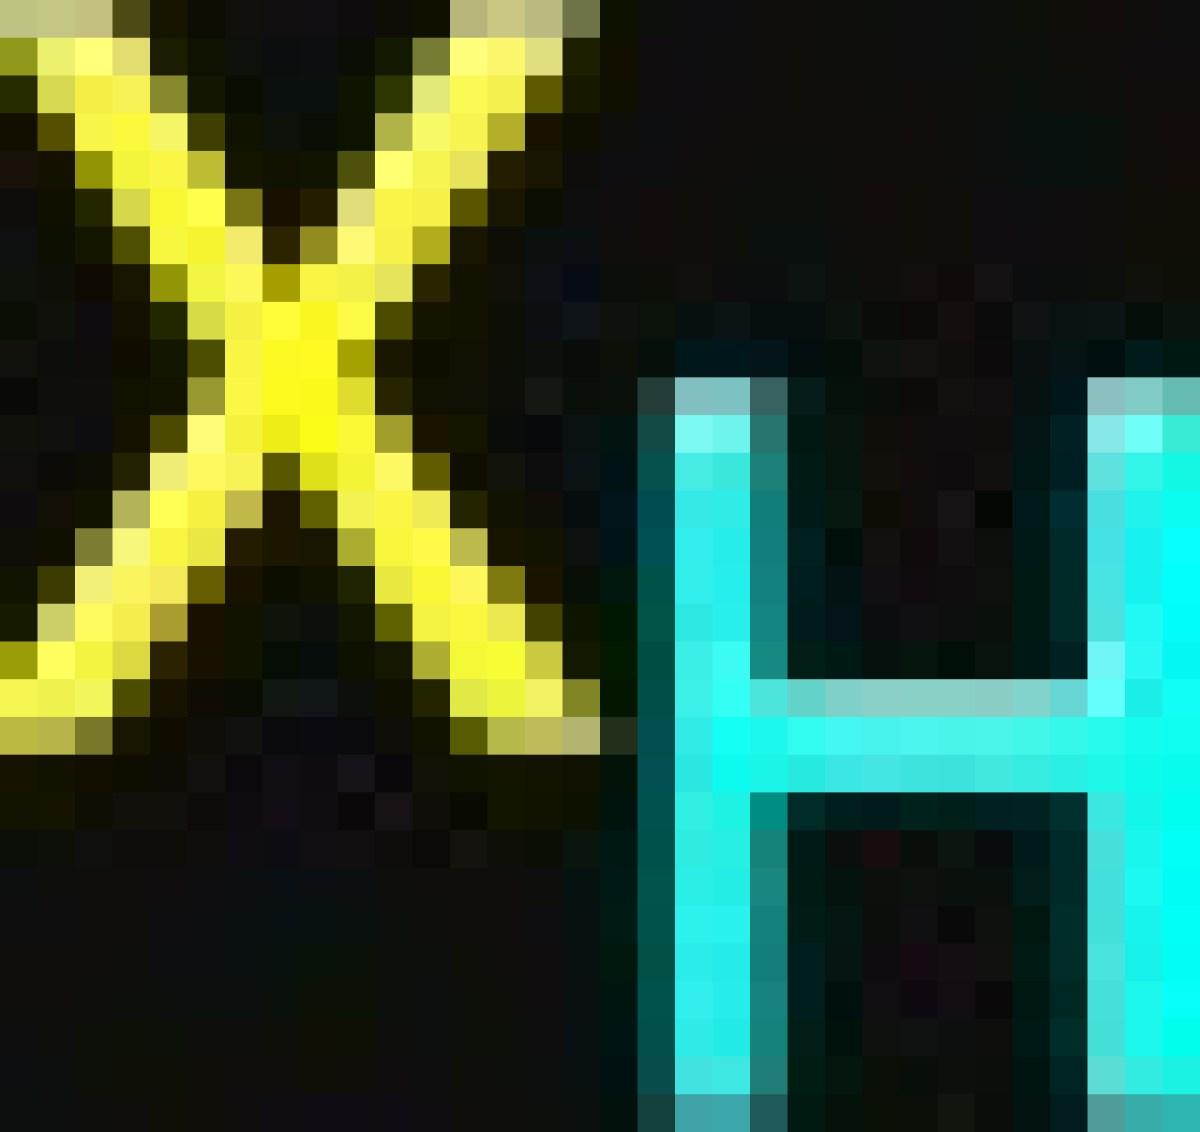 Tu Hi by Ashir (Full Song Released)